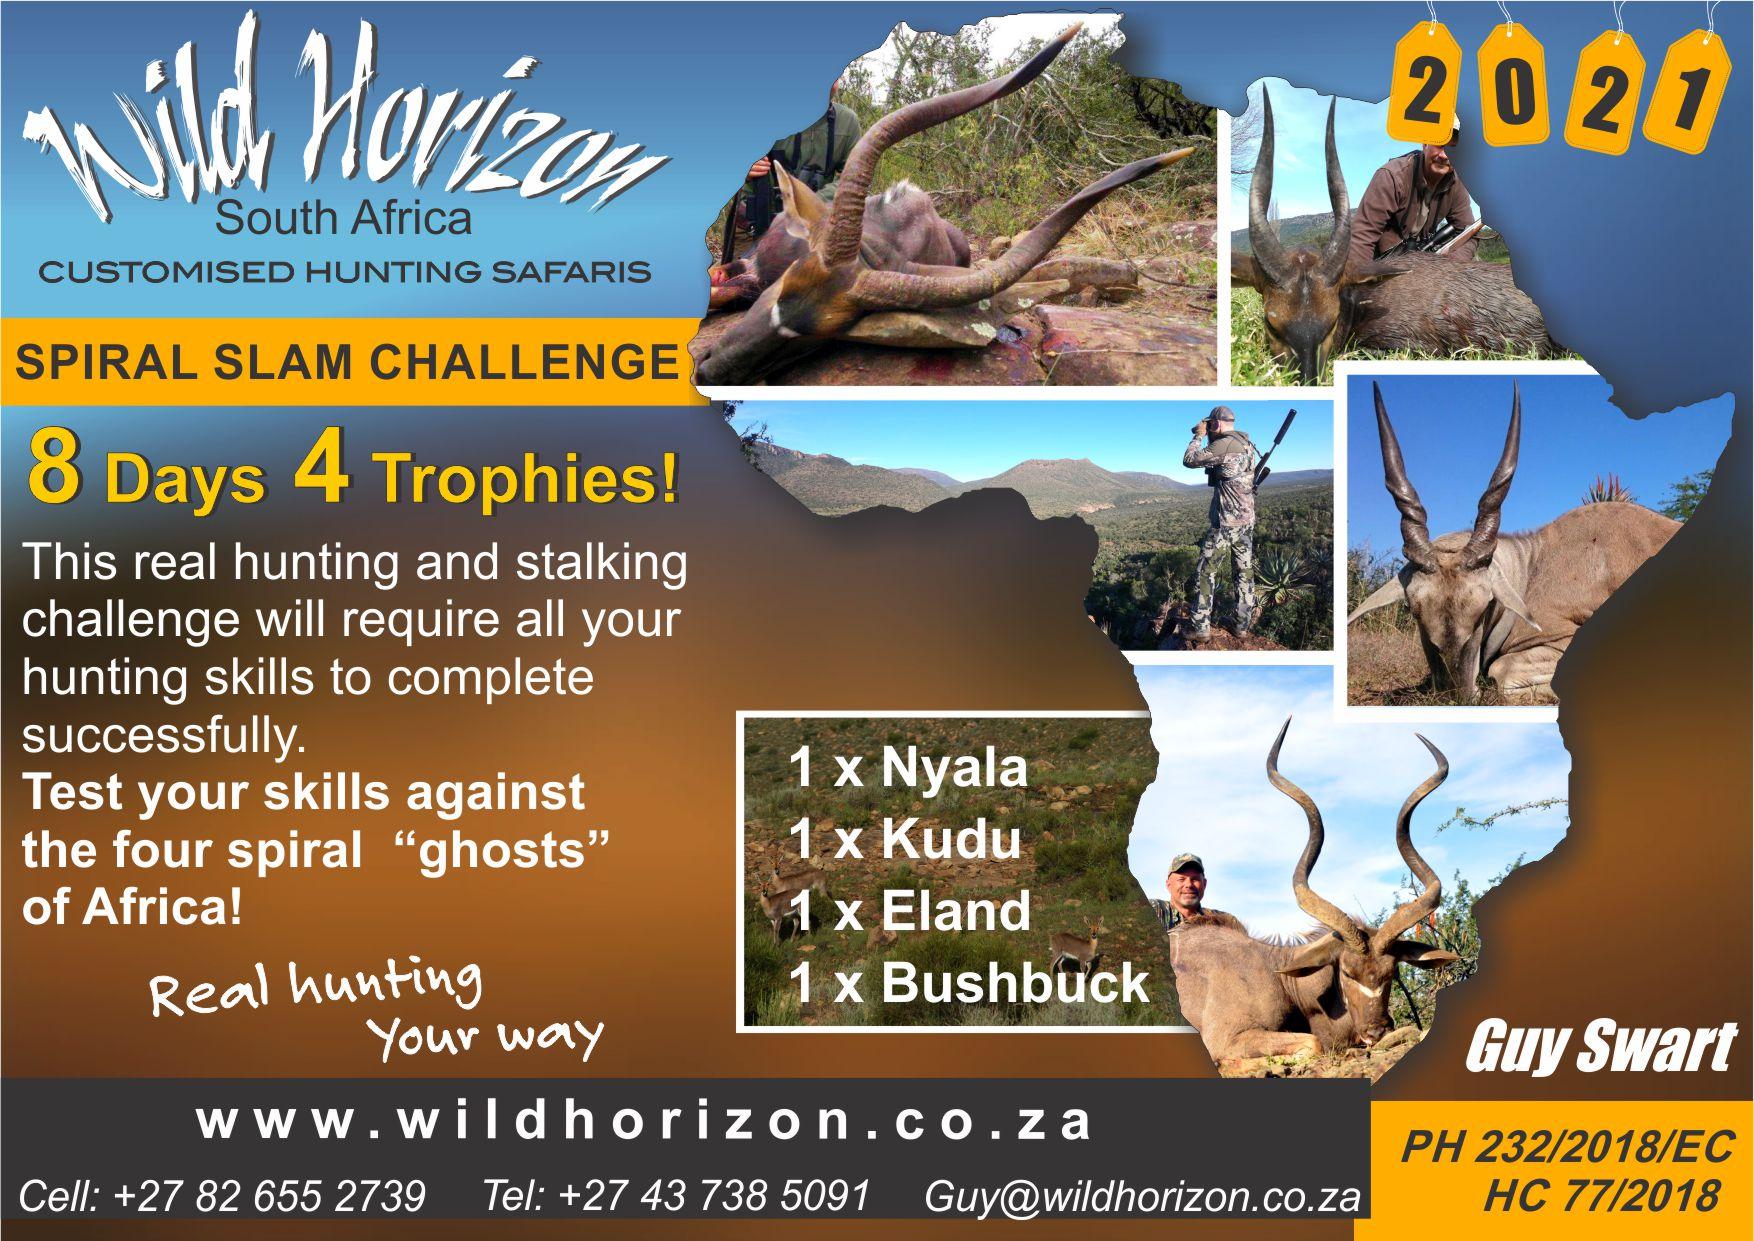 Wild Horizon South Africa - Spiral Slam